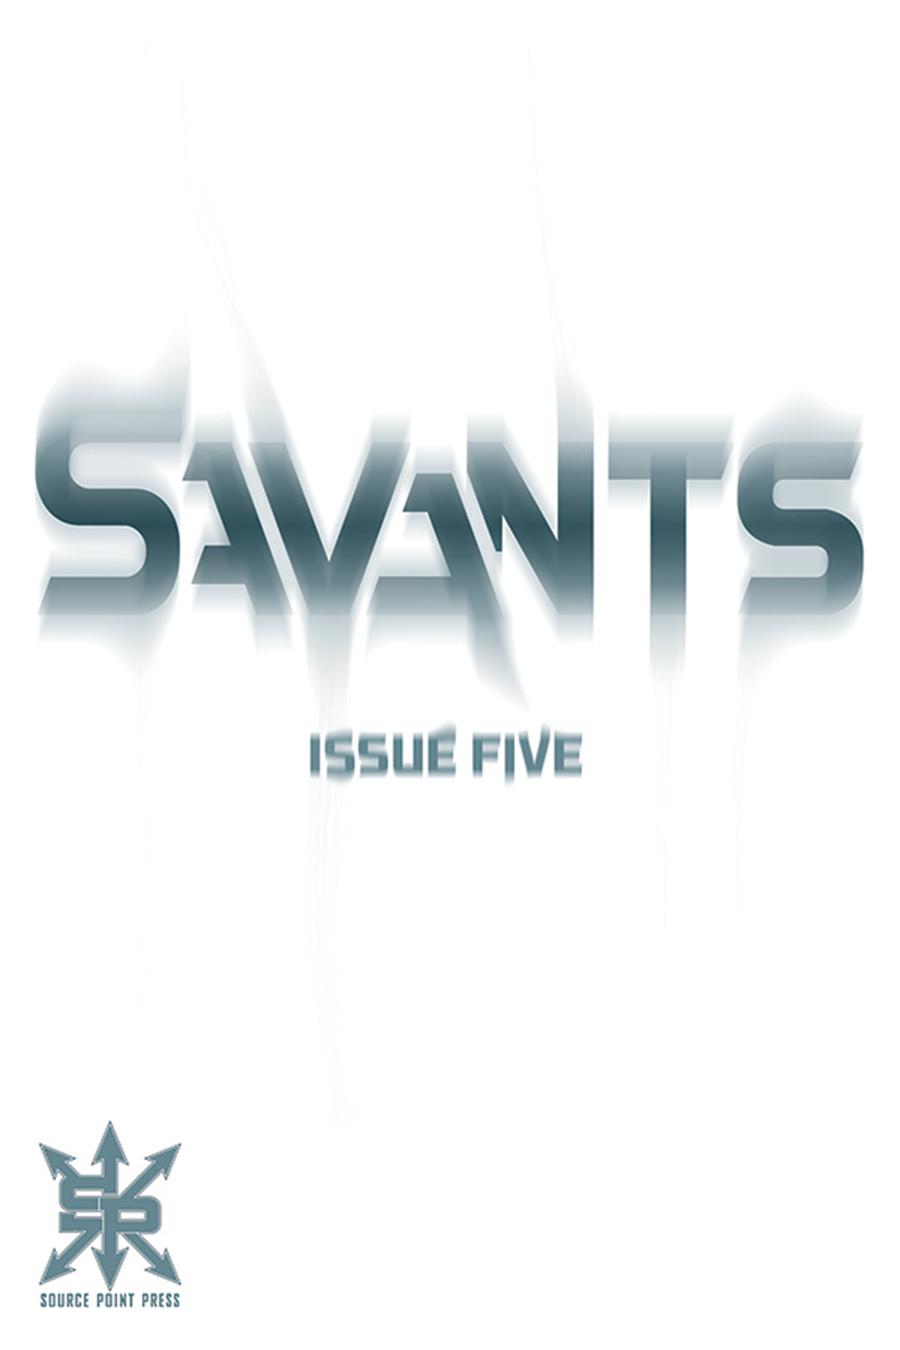 Savants no. 5 (5 of 5) (2018 Series)